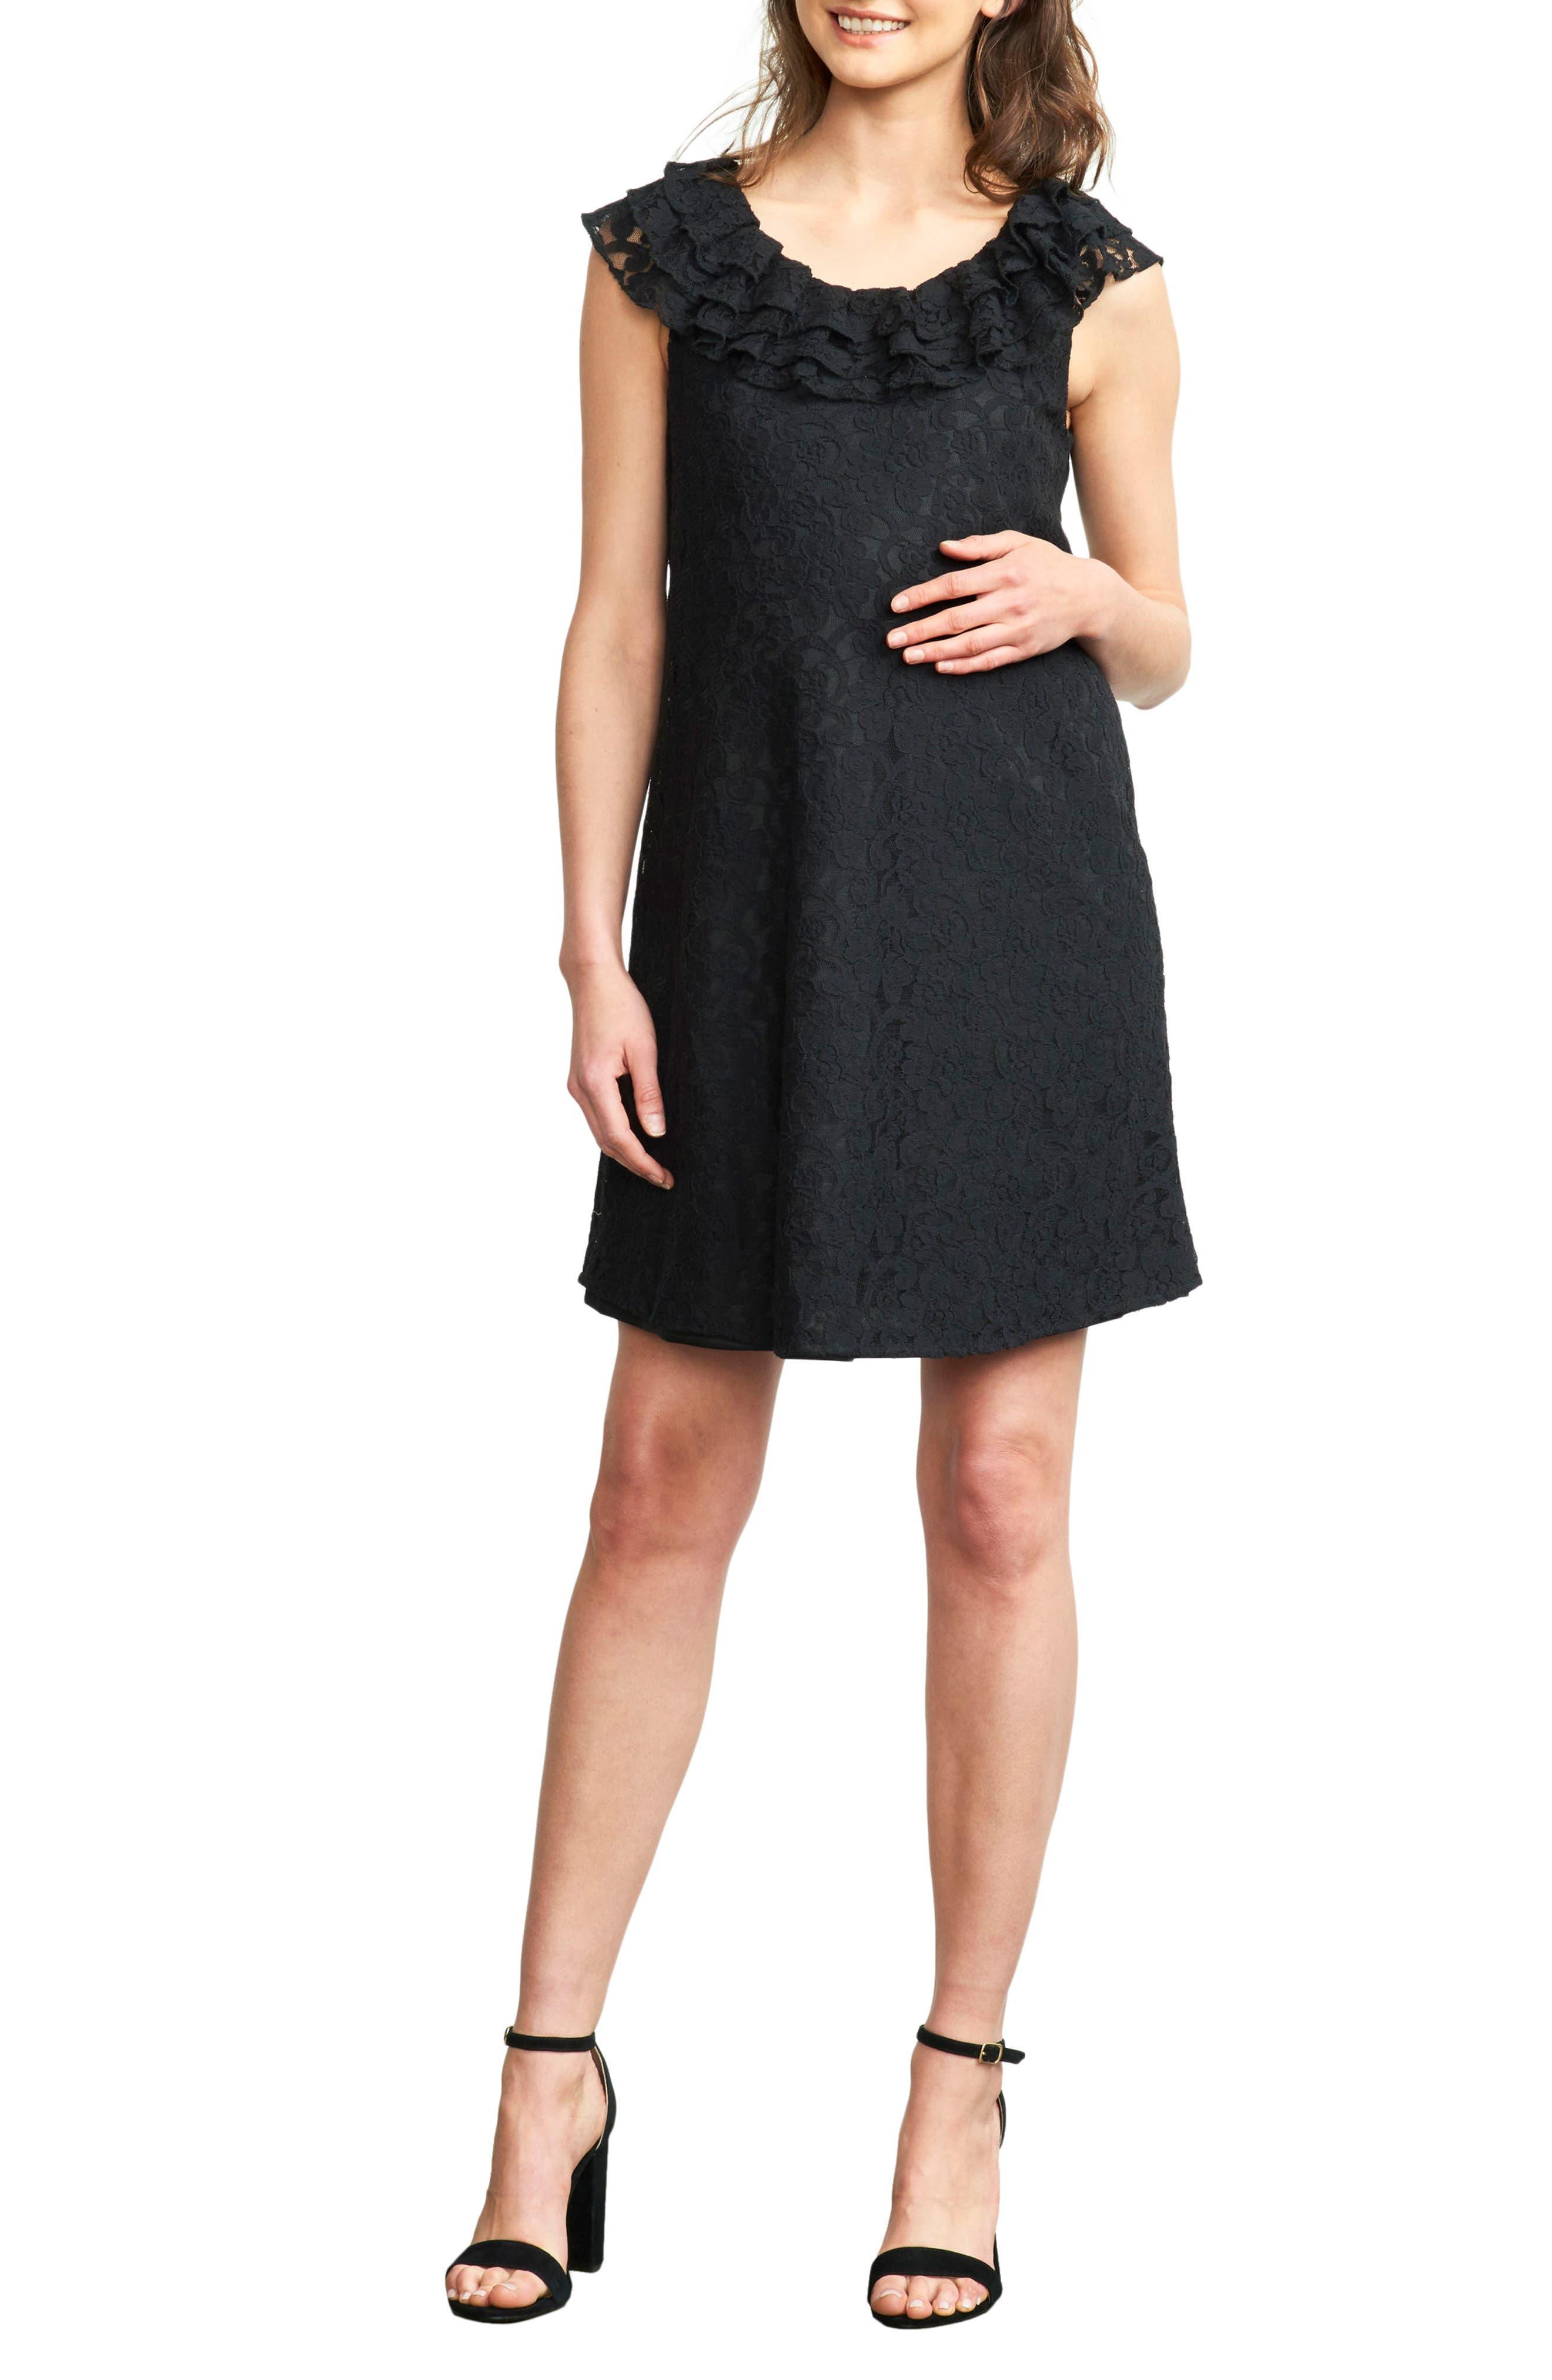 Maternal America Ruffled Maternity Dress, Black